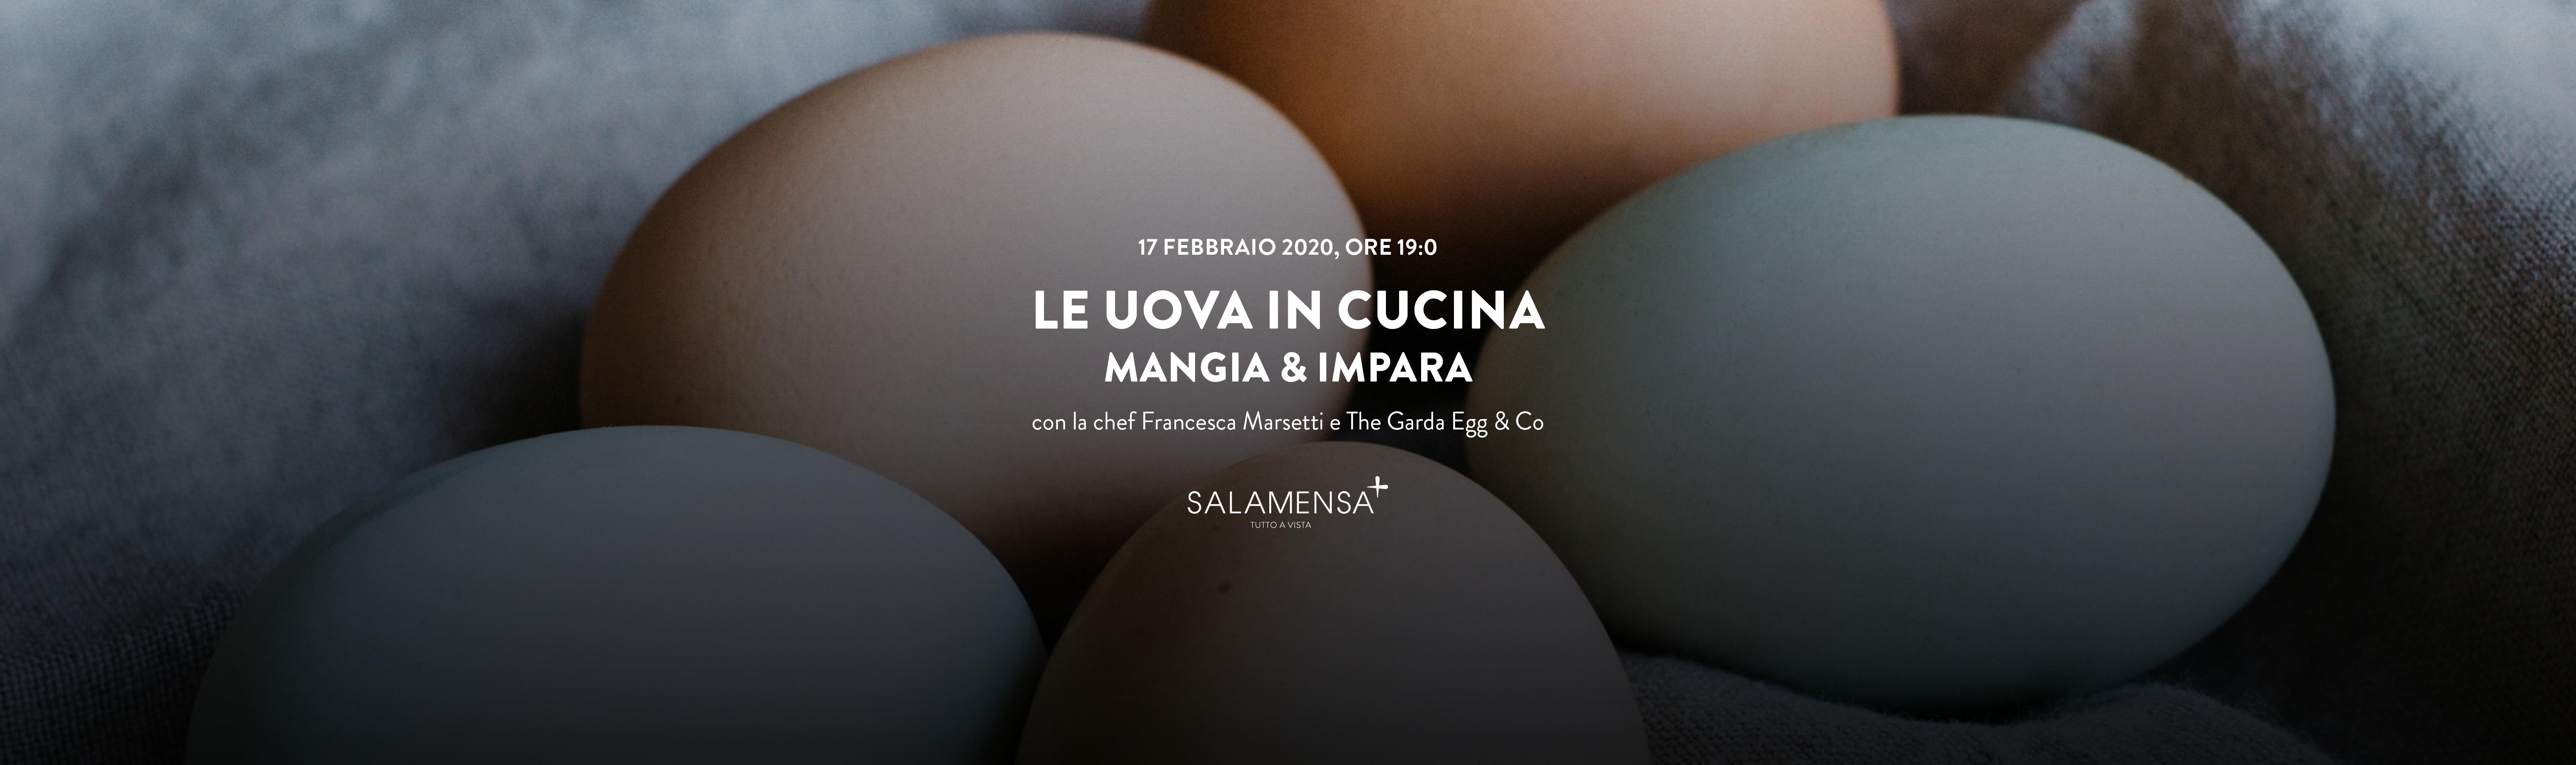 Salamensa | Le uova in cucina